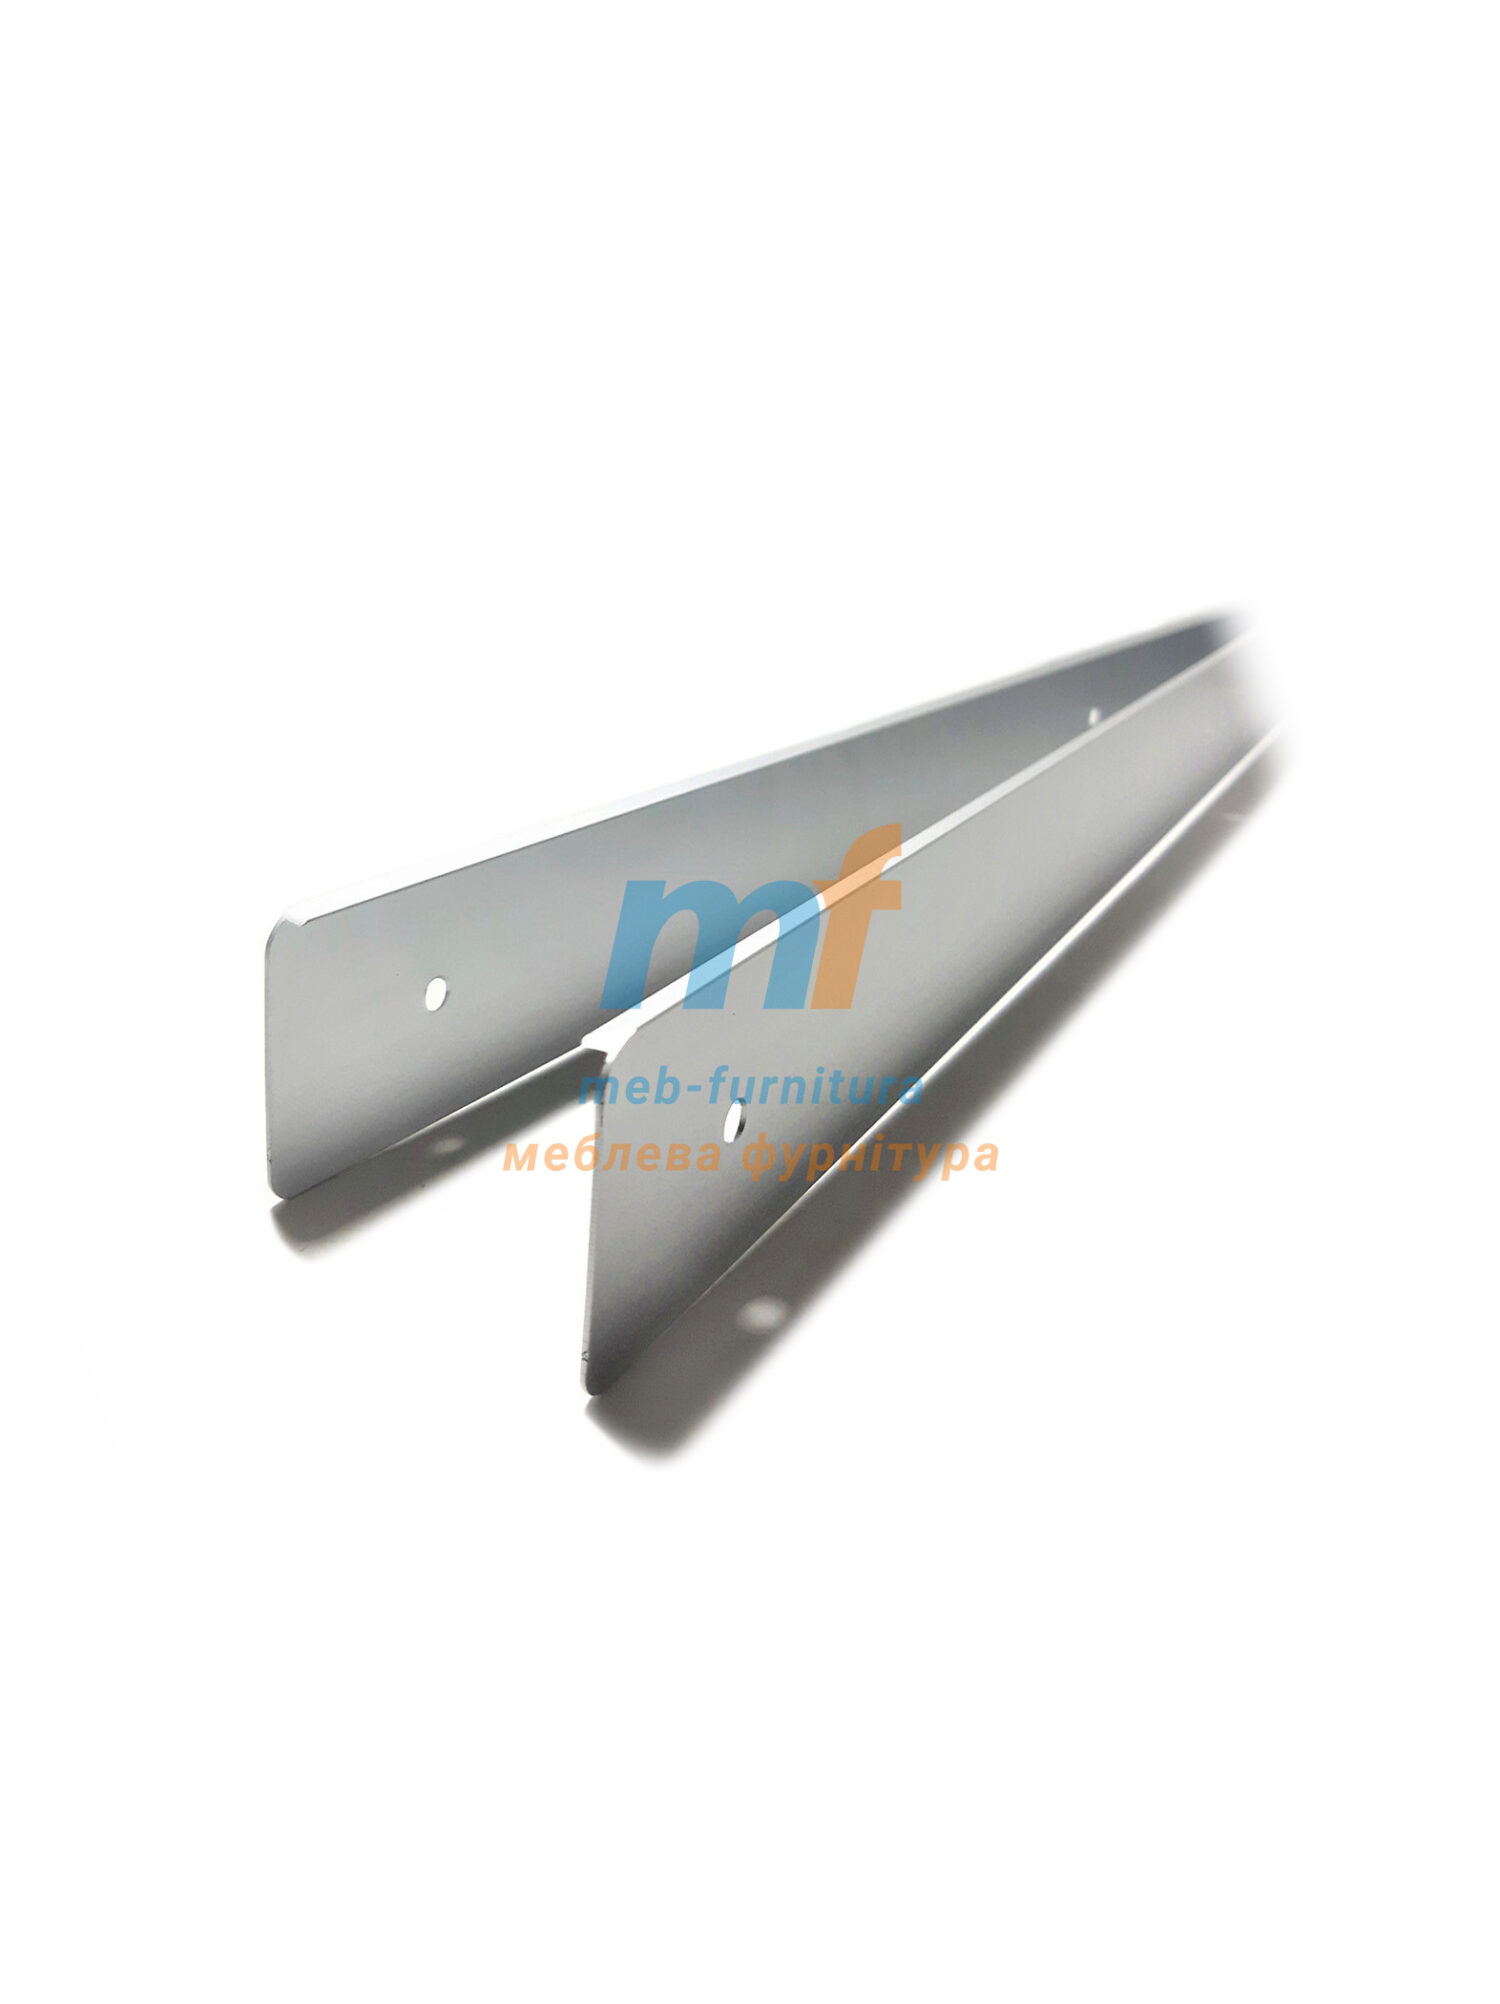 Планка для столешницы - торцевая L+R 38 мм R6 U серебро